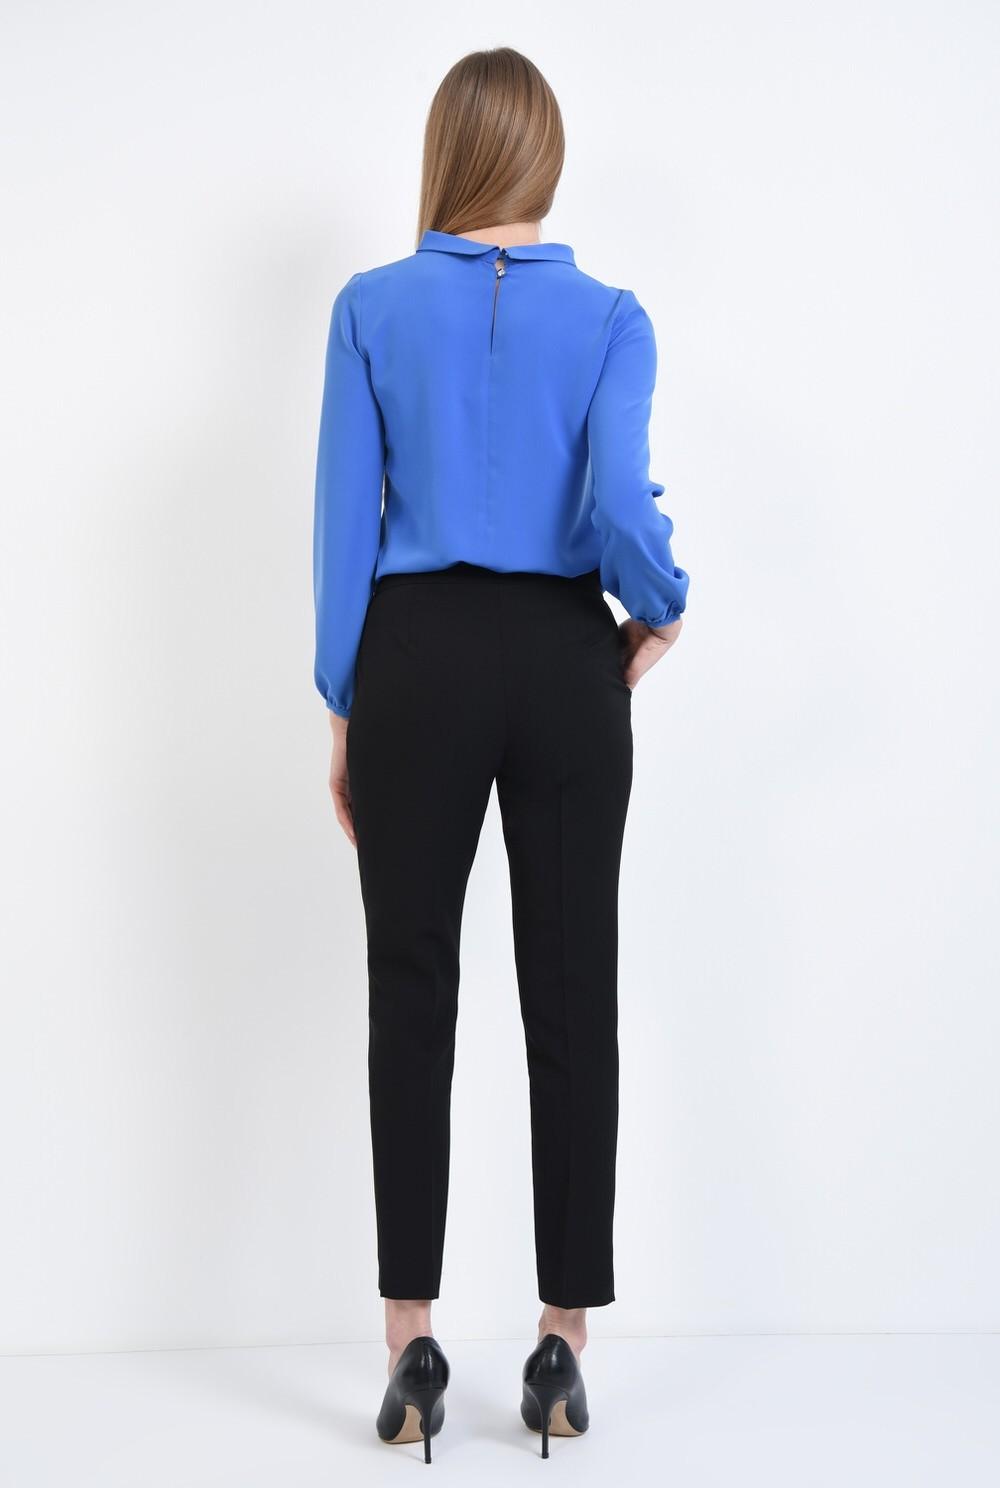 1 - Bluza office, albastru